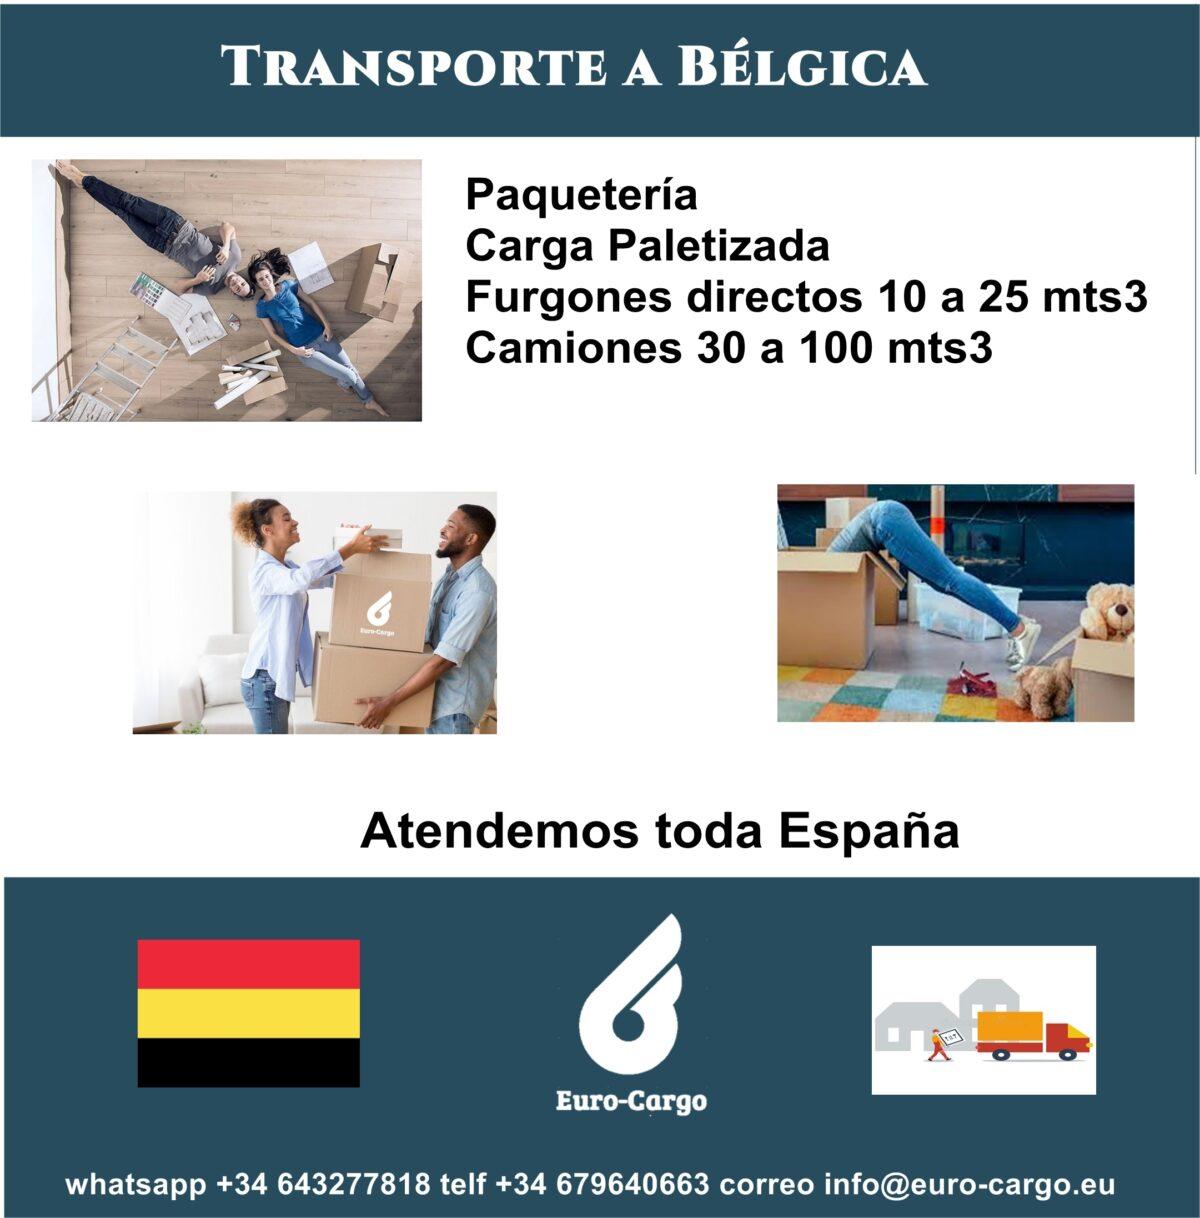 Mudanzas-a-Belgica-Grupajes-1-1200x1218.jpg